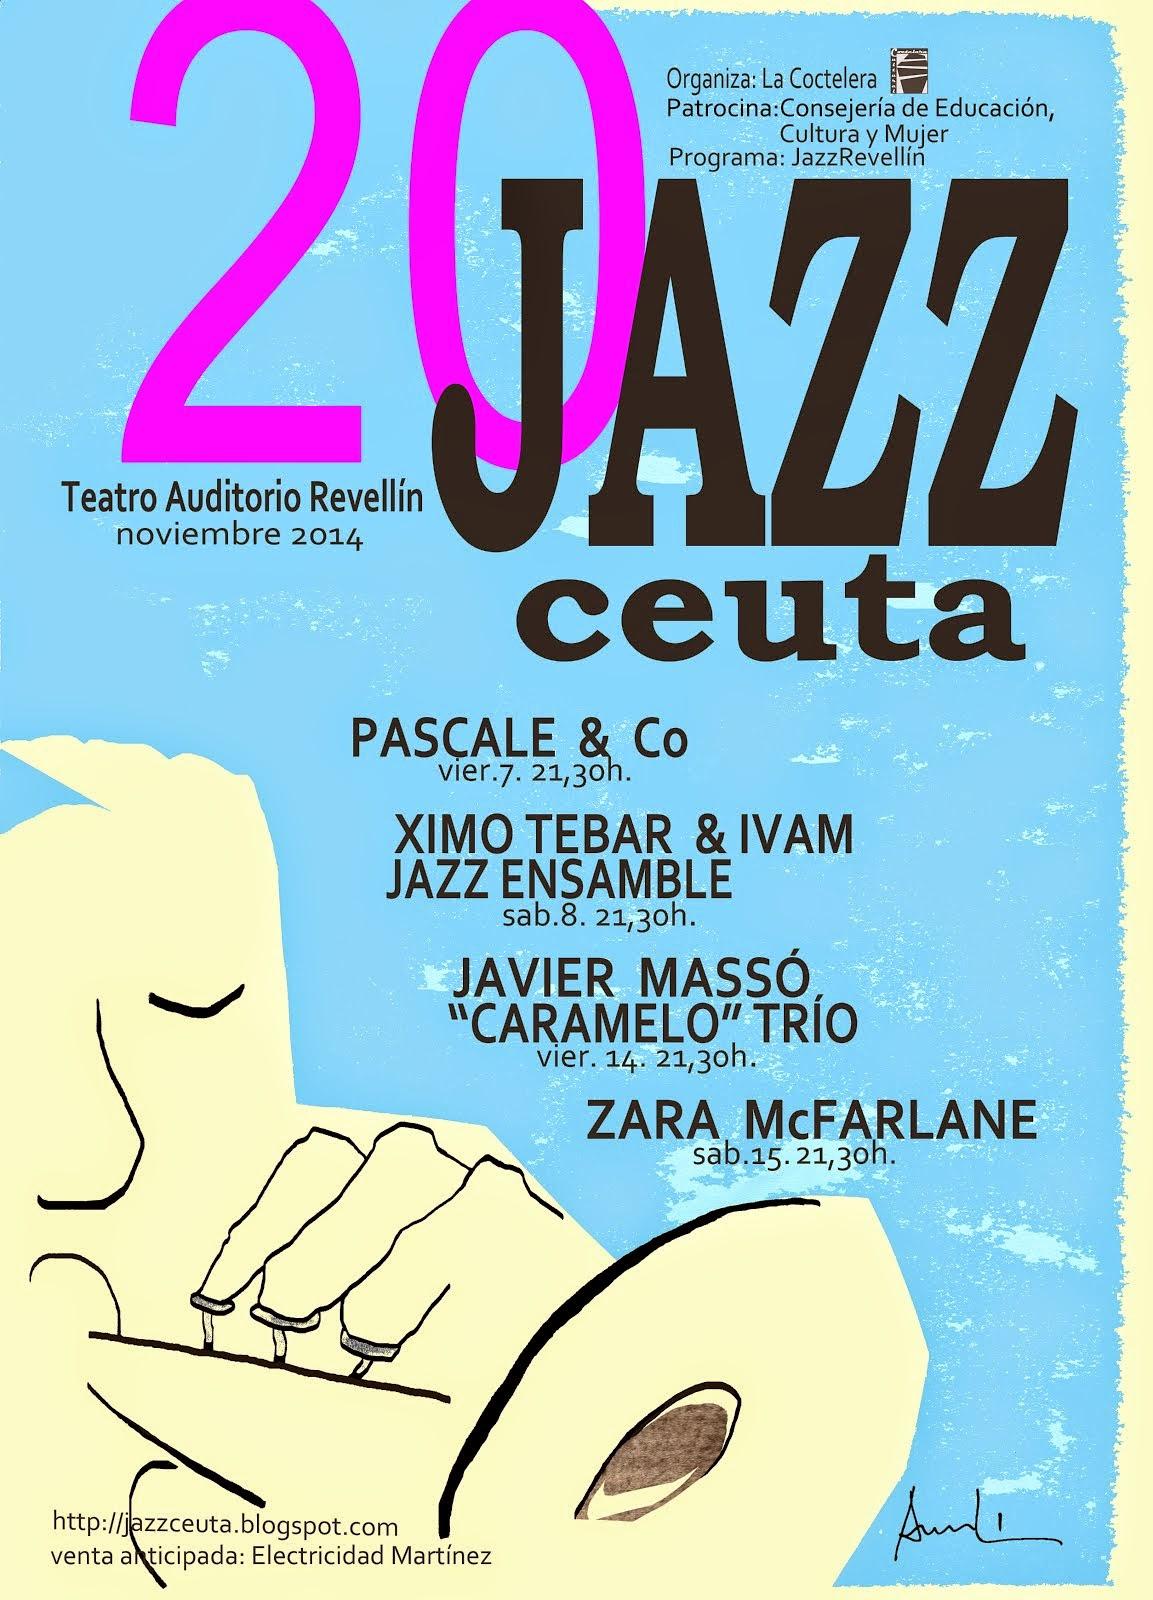 XX FESTIVAL DE JAZZ DE CEUTA